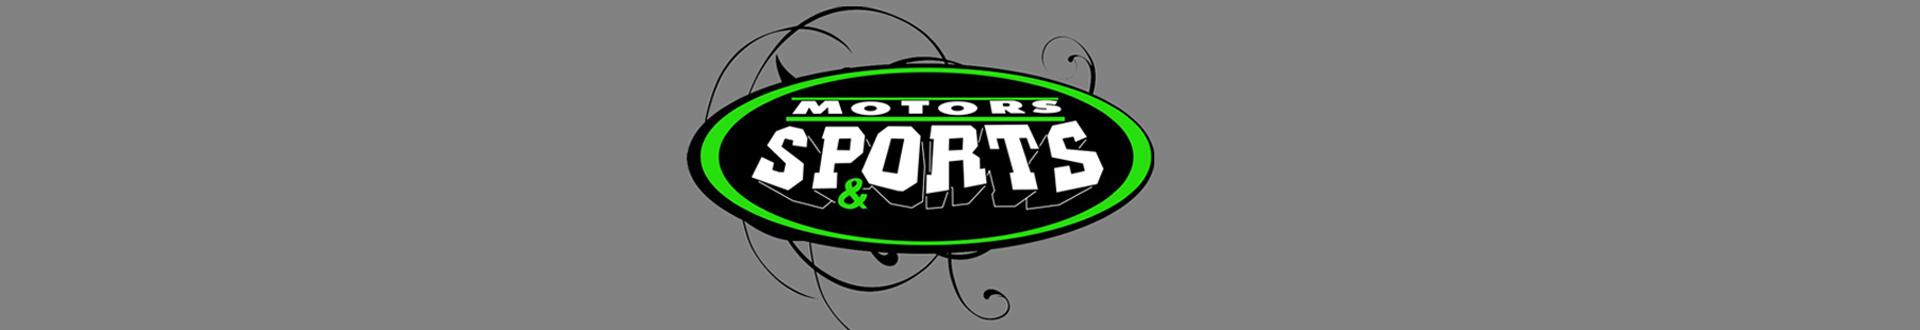 Motors i Sports Sports Mollerussa Lleida